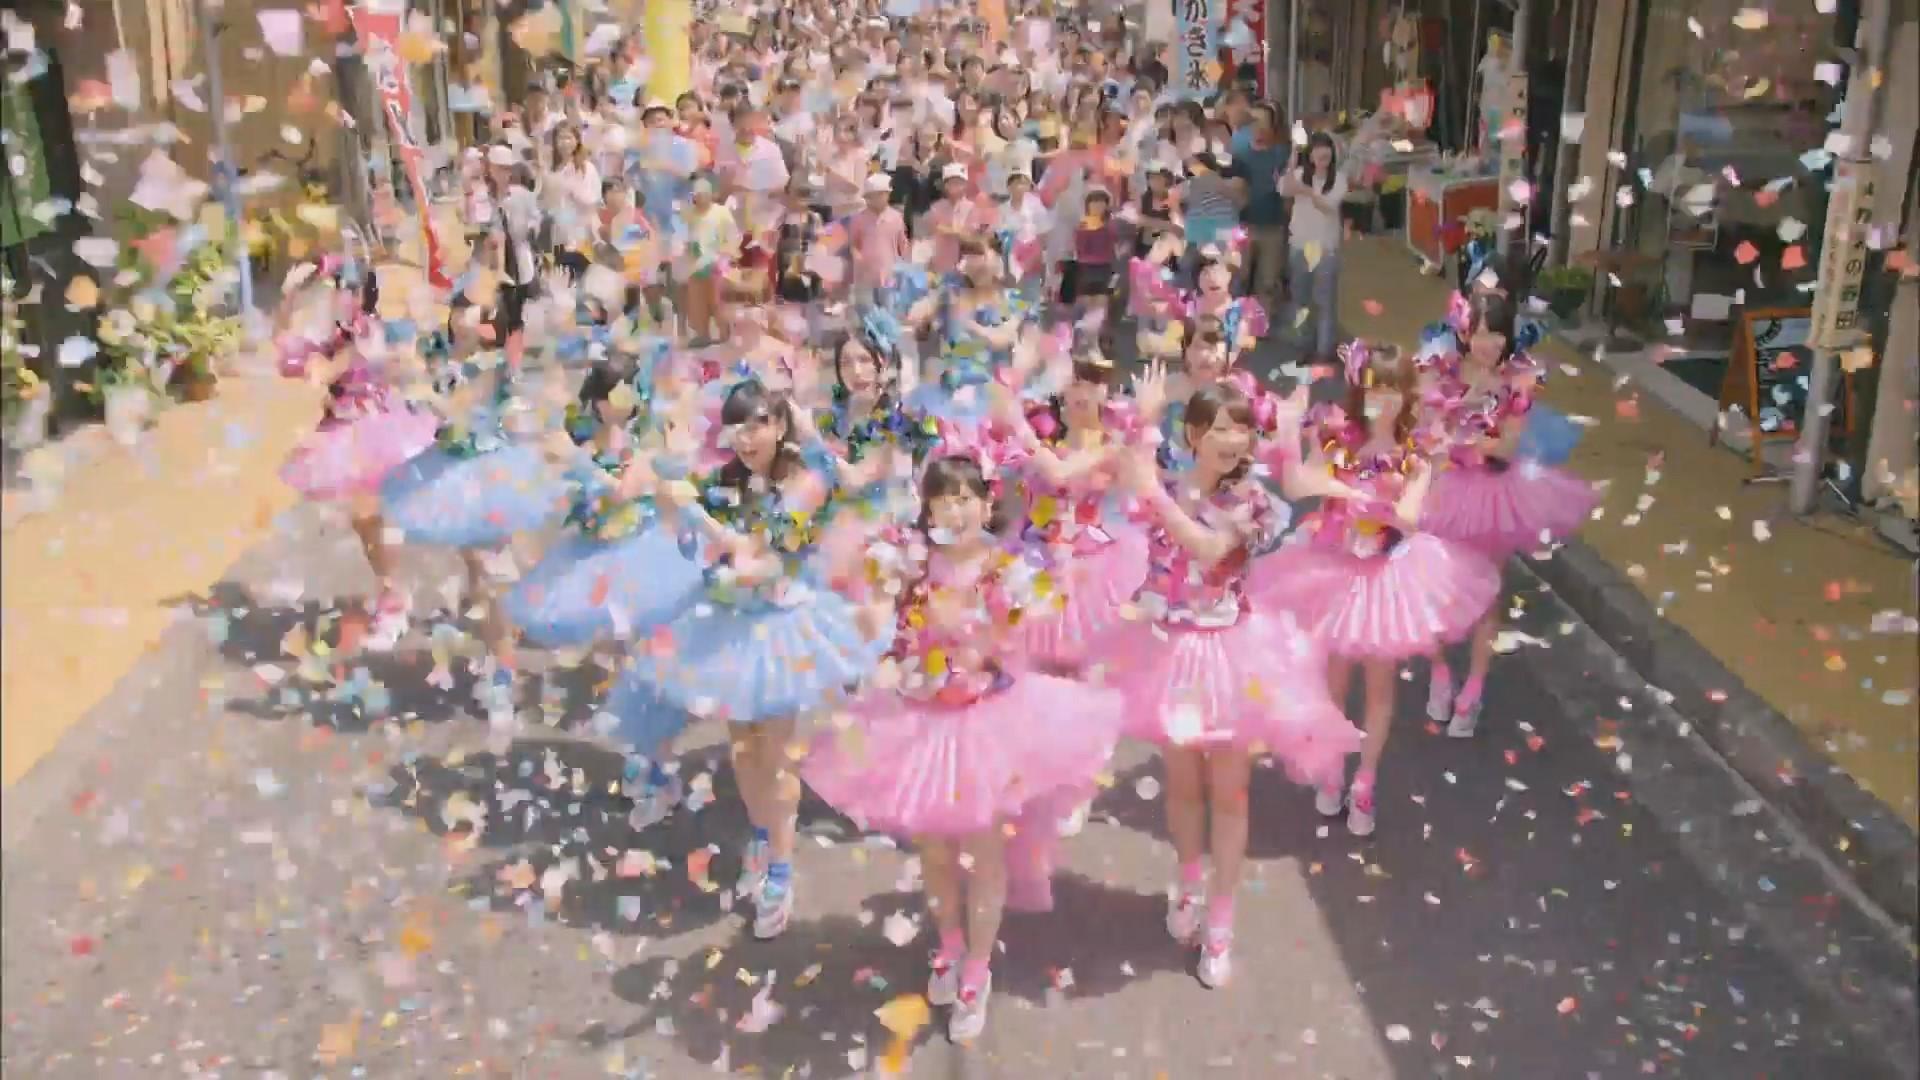 AKB48新曲「心のプラカード」のMVが「恋するフォーチュンクッキー」に似てると話題にwwww(動画あり)